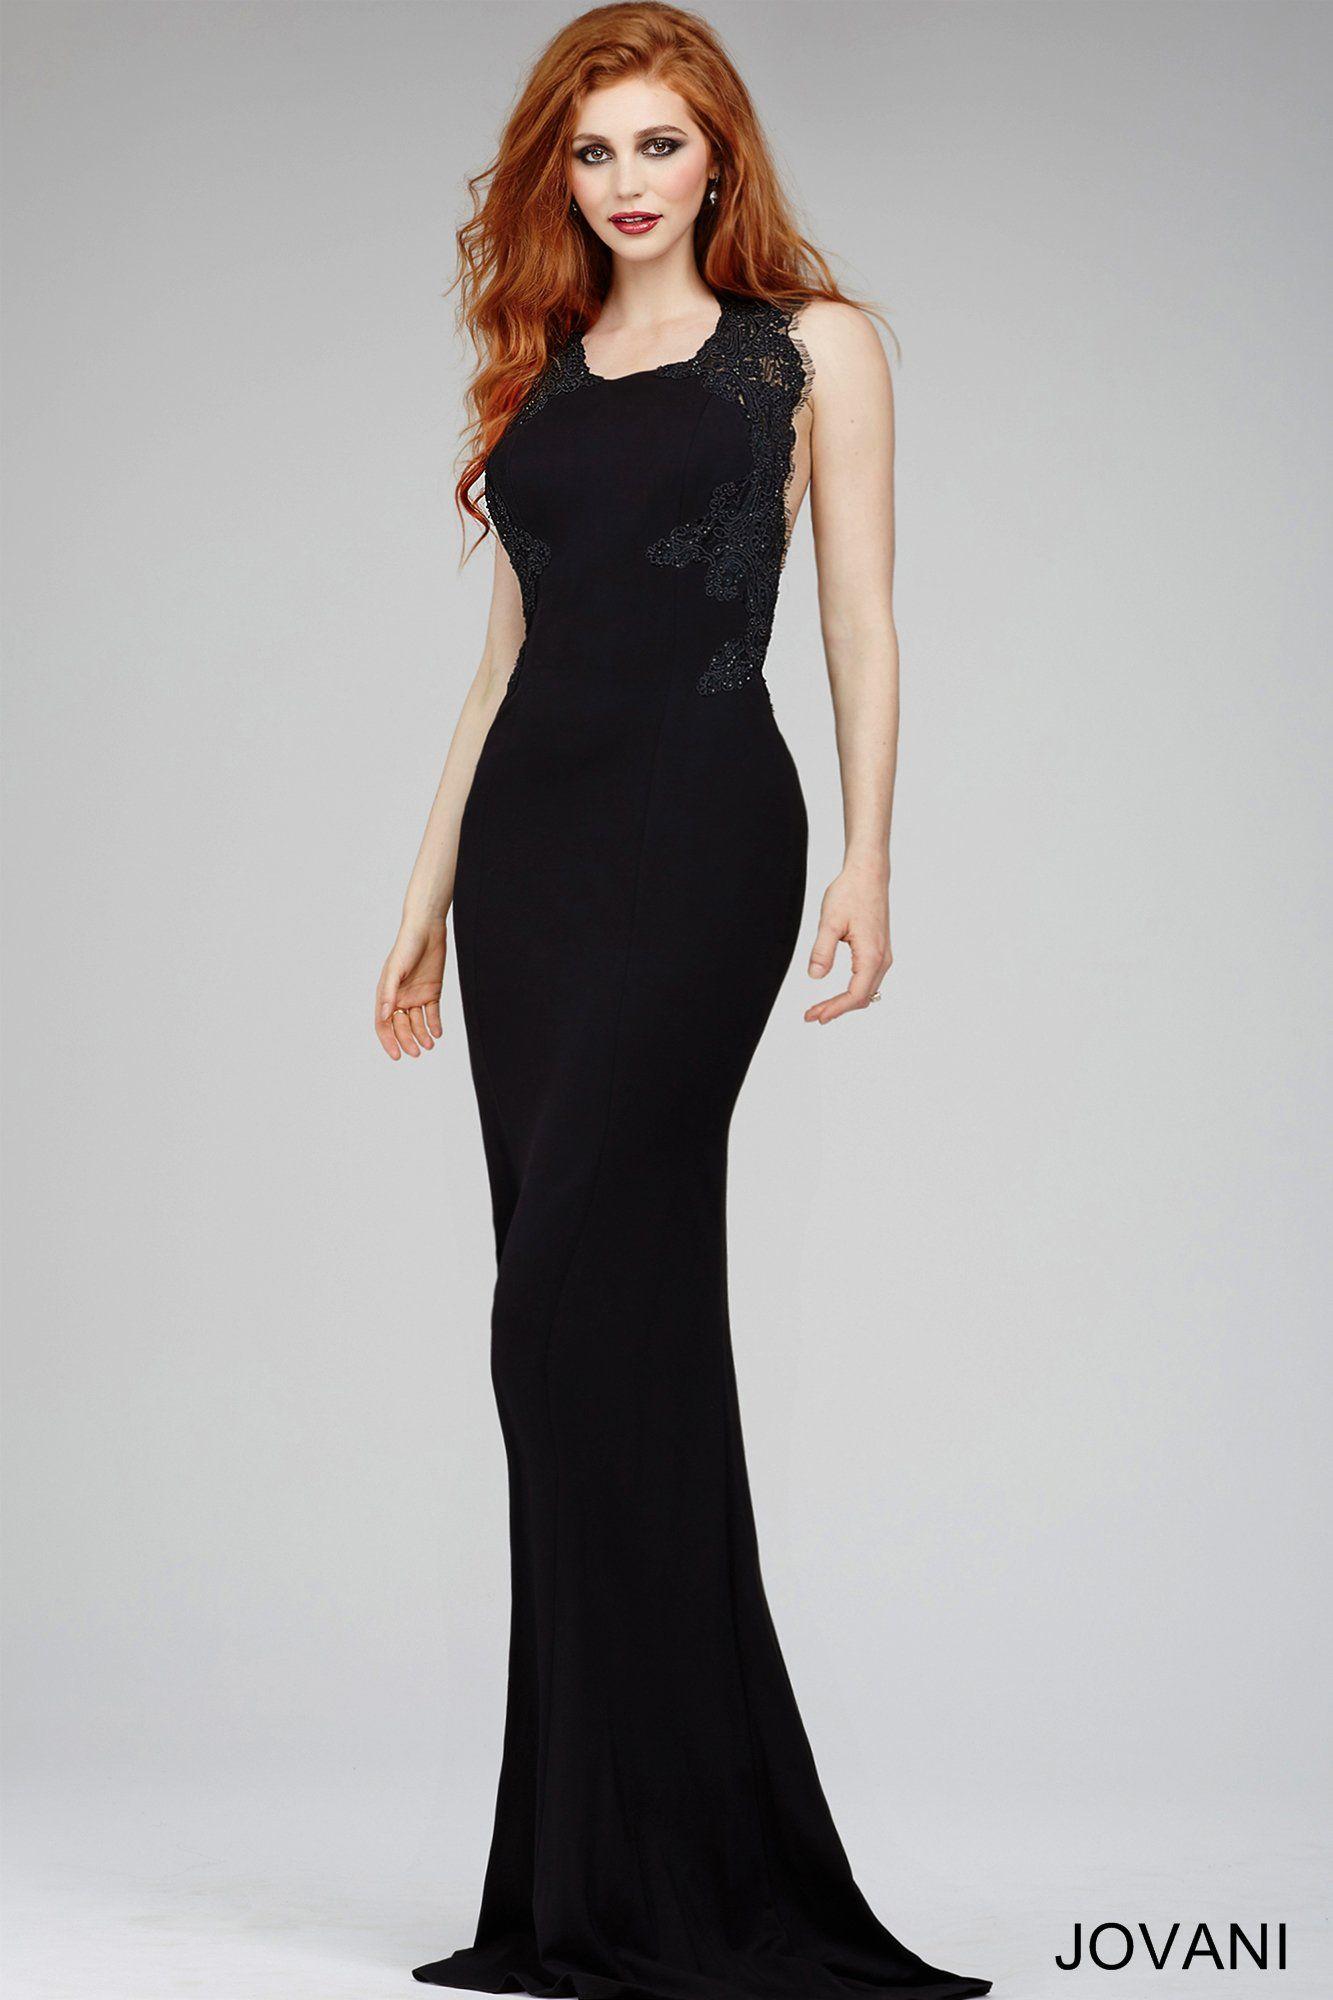 Black mermaid dress jovani pinterest black mermaid dress